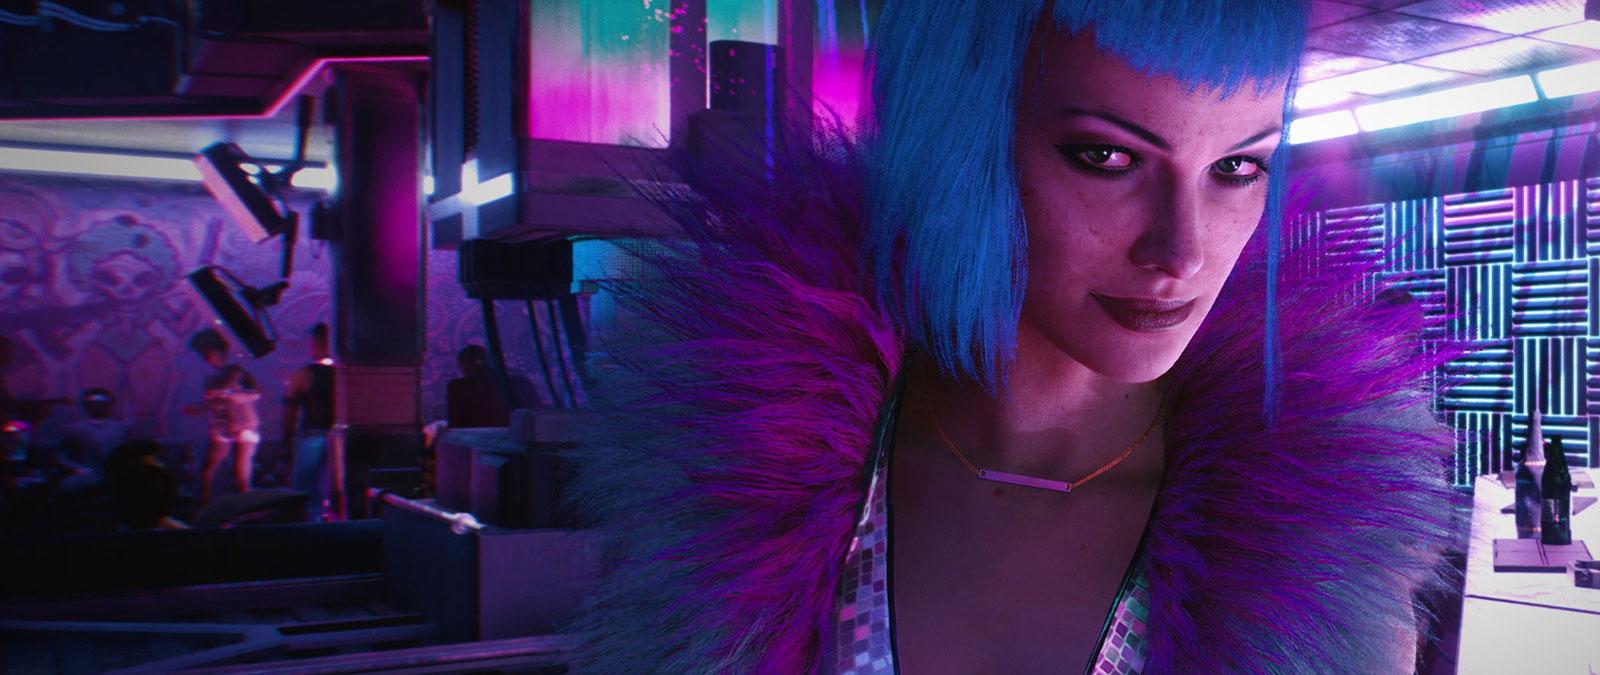 A woman smirks in a brightly lit neon club